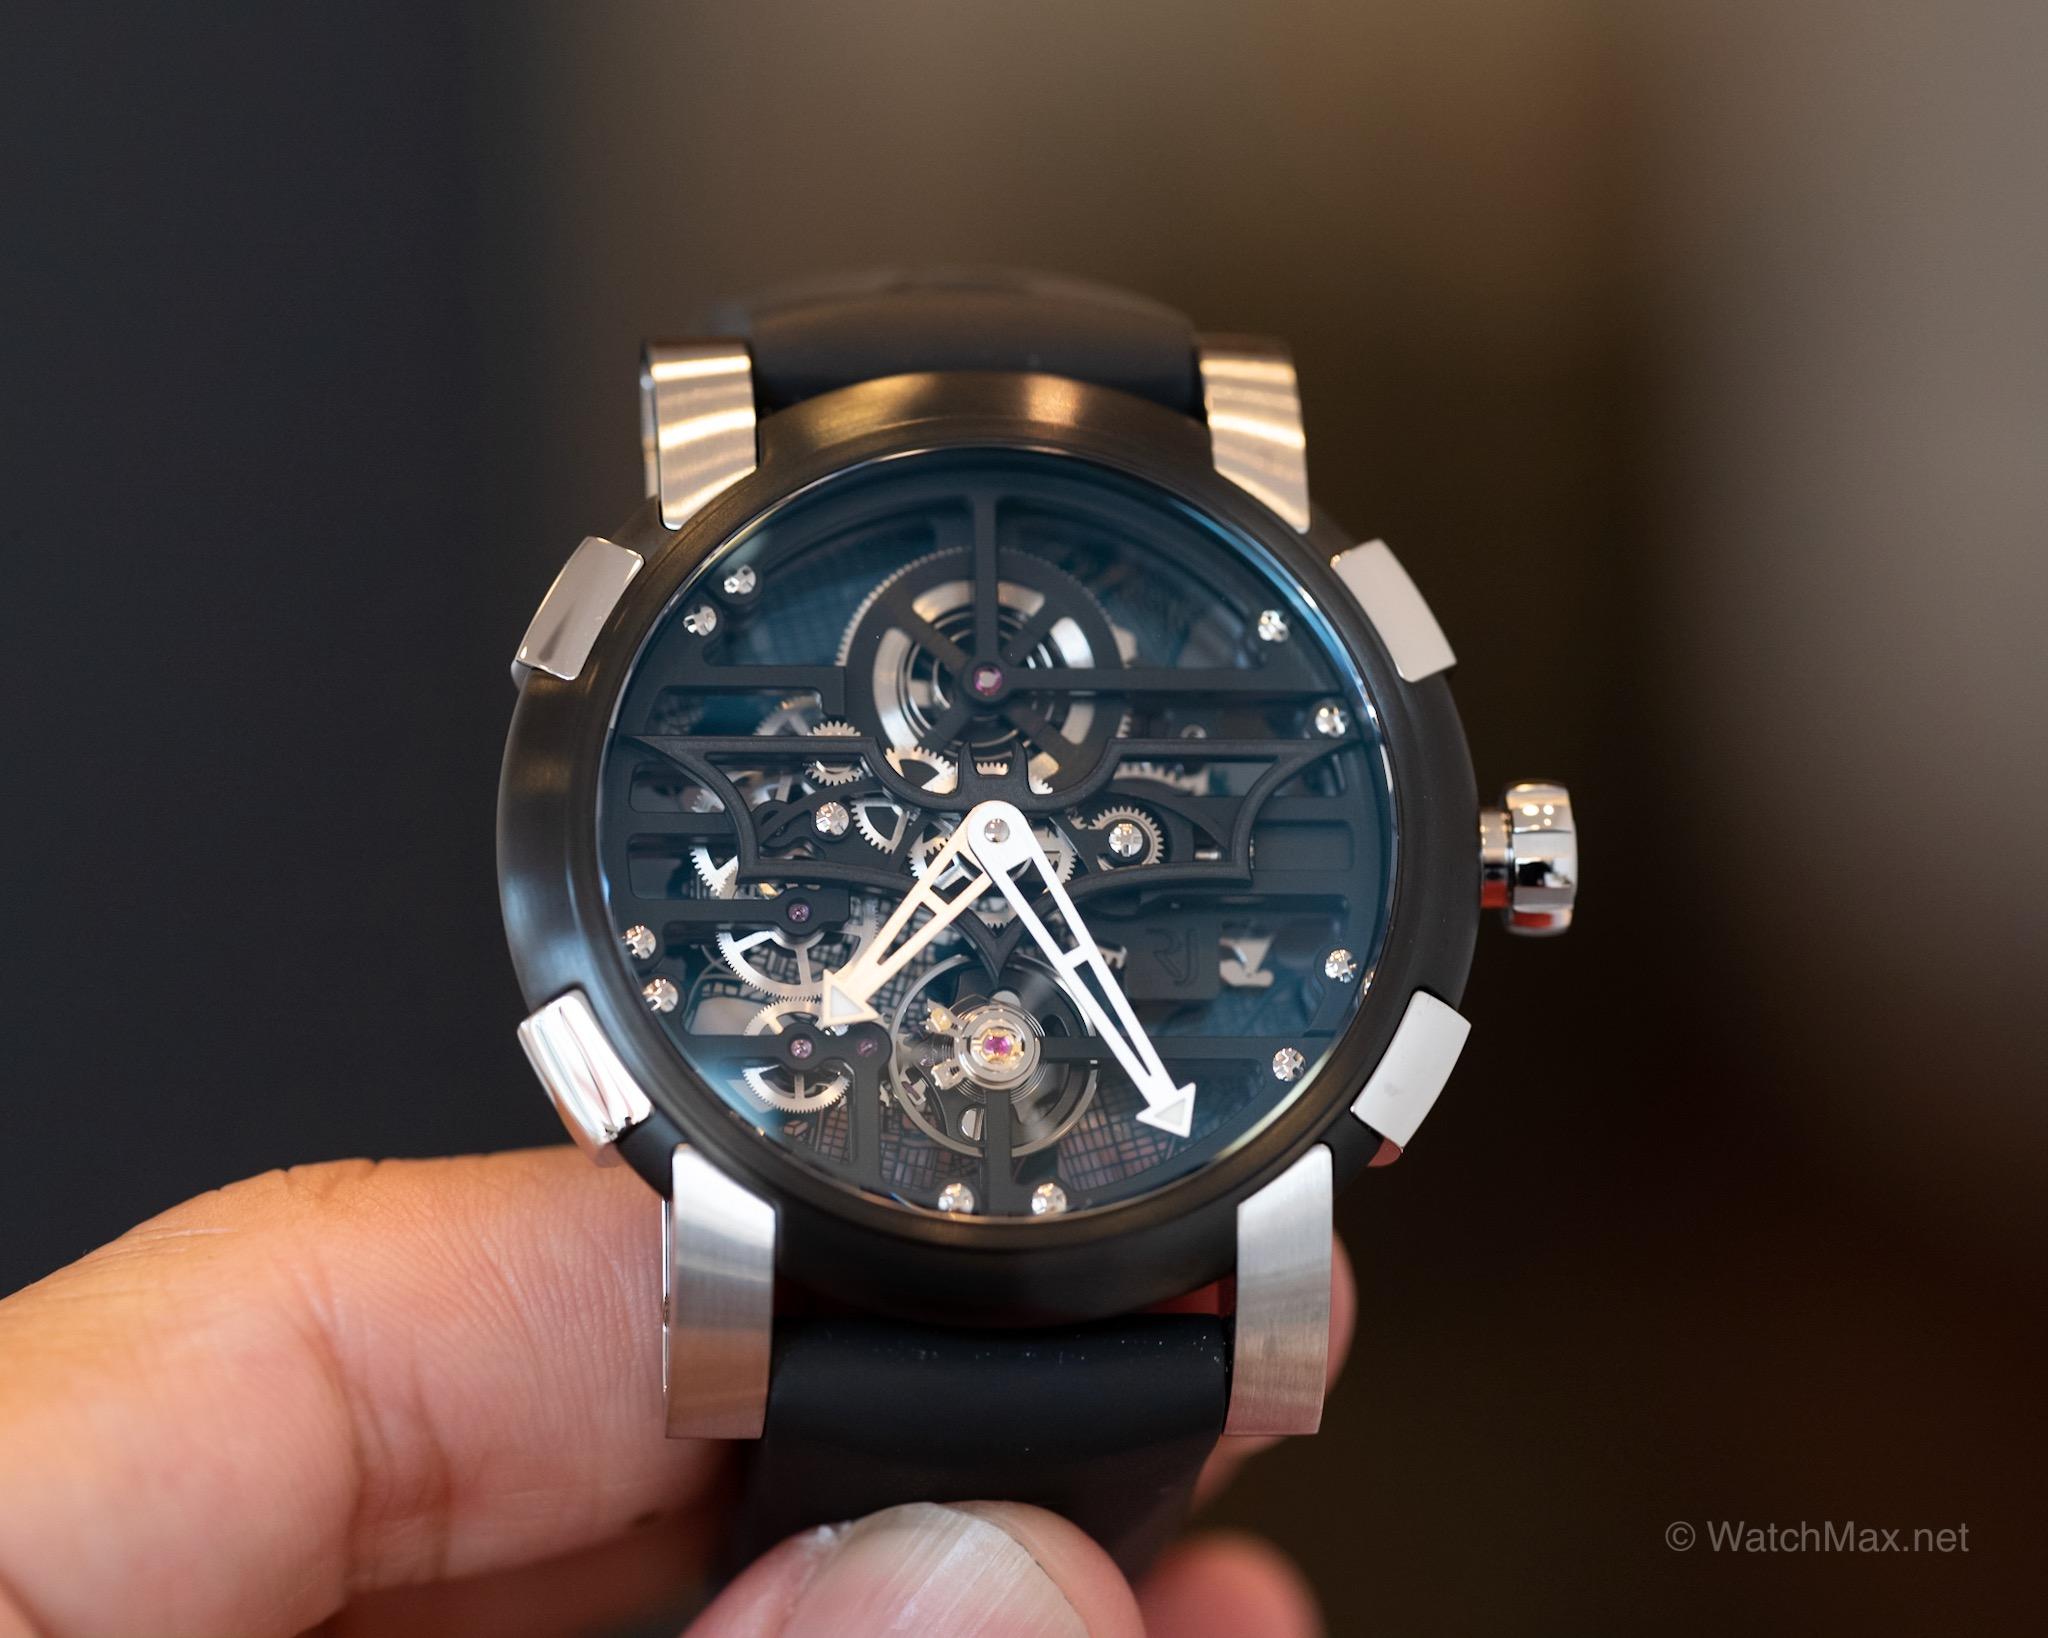 RJ's Batman 2017 watch showing the Bat logo as part of the skeleton dial